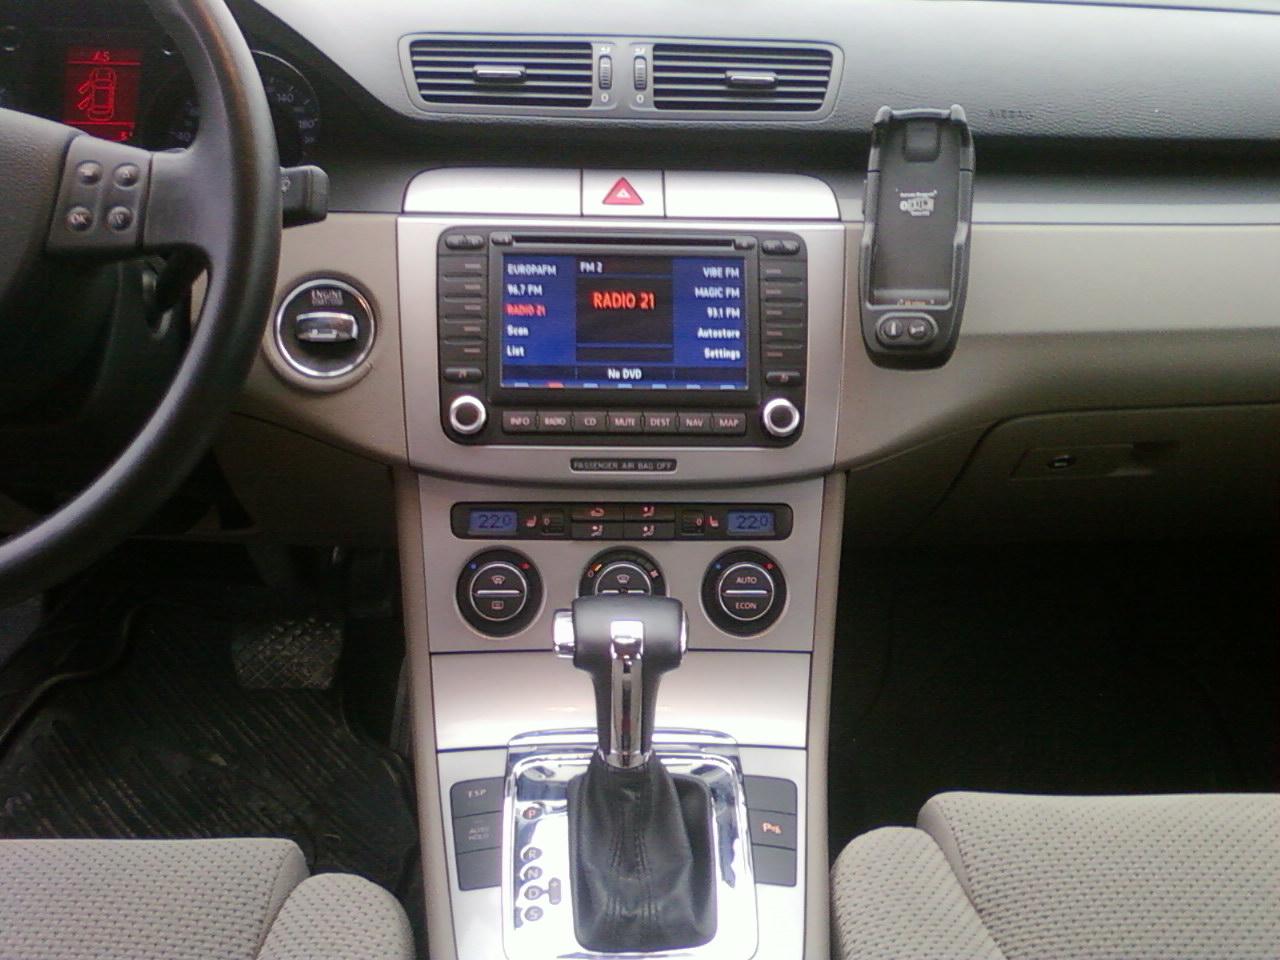 Vw passat comfortline 2,0 tdi  model 2006